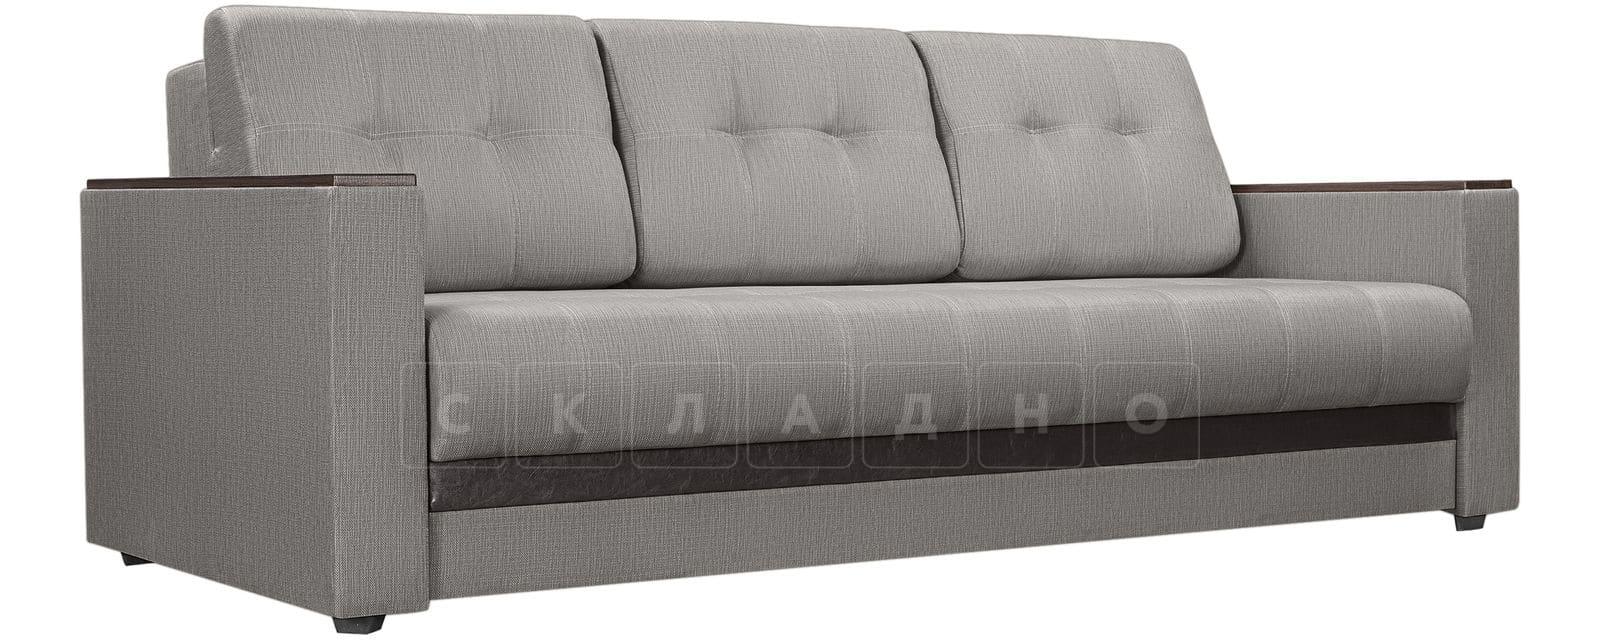 Диван Атланта рогожка серого цвета фото 1 | интернет-магазин Складно